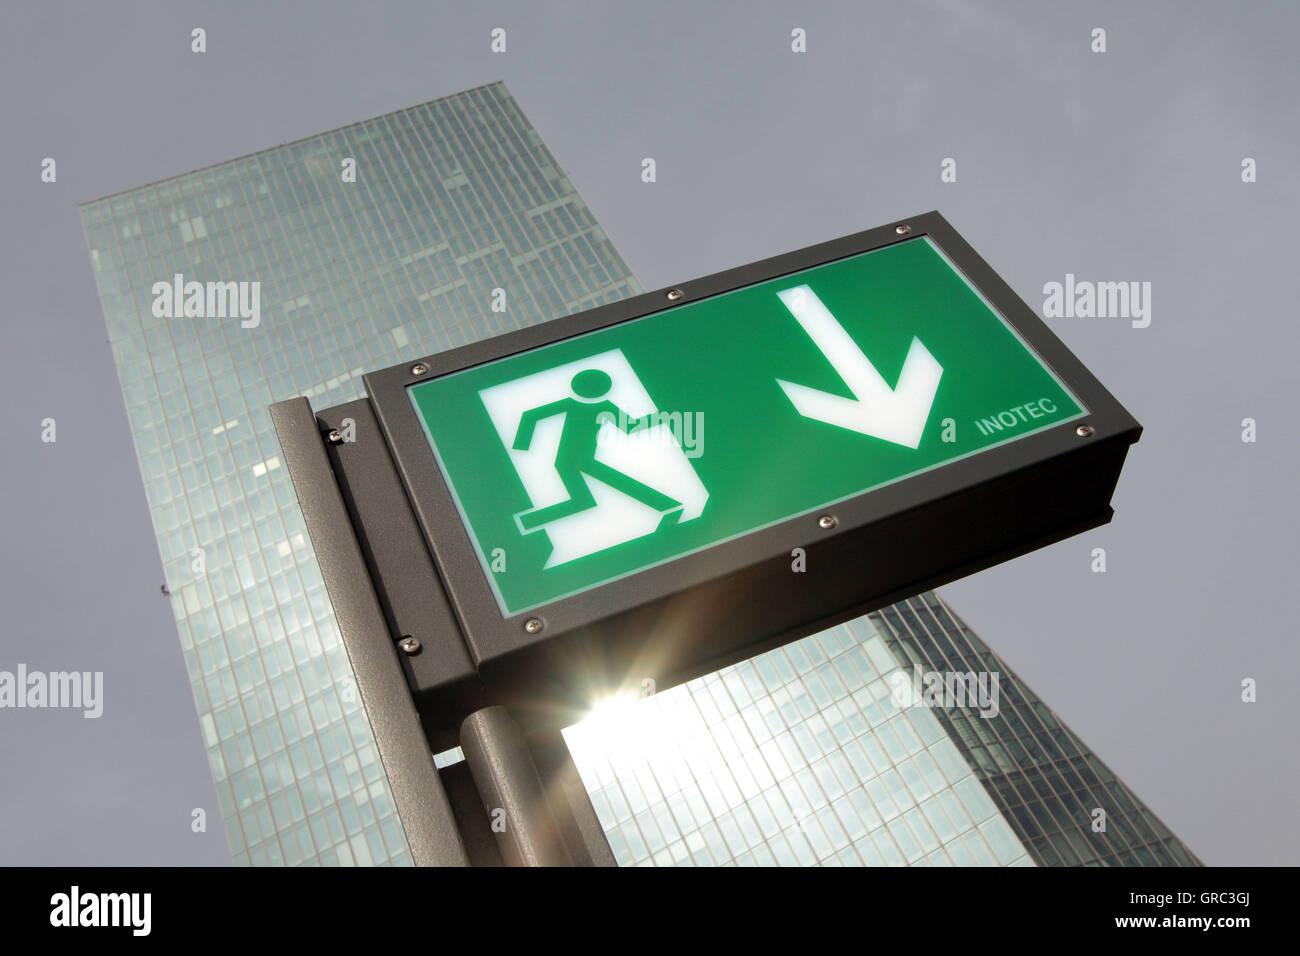 Emergency Ext segno con la BCE Banca centrale europea Highrise Immagini Stock